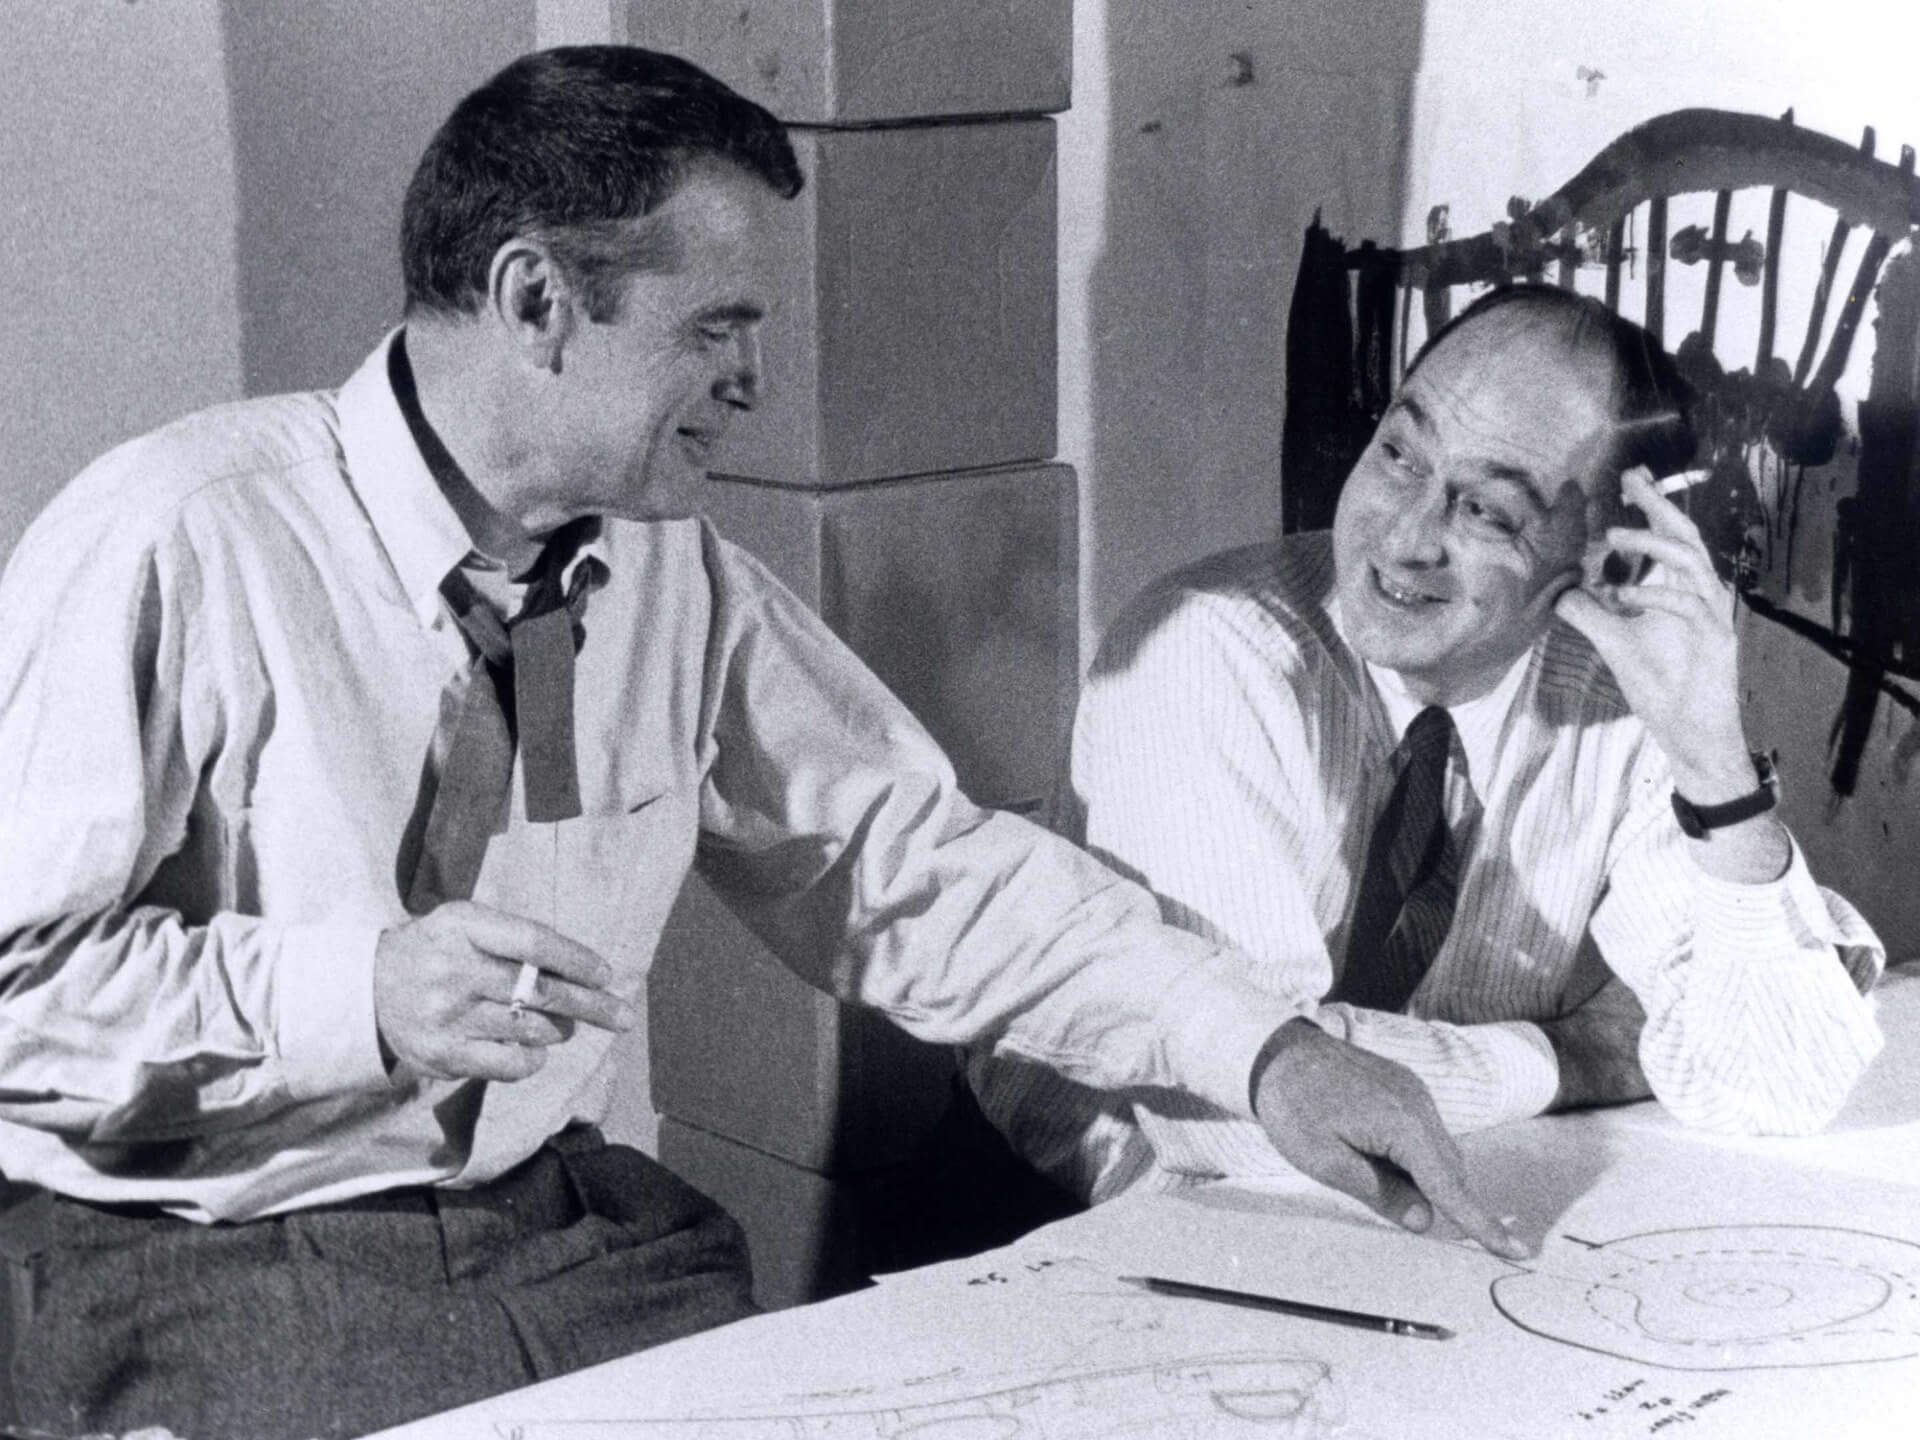 Designers - Herman Miller